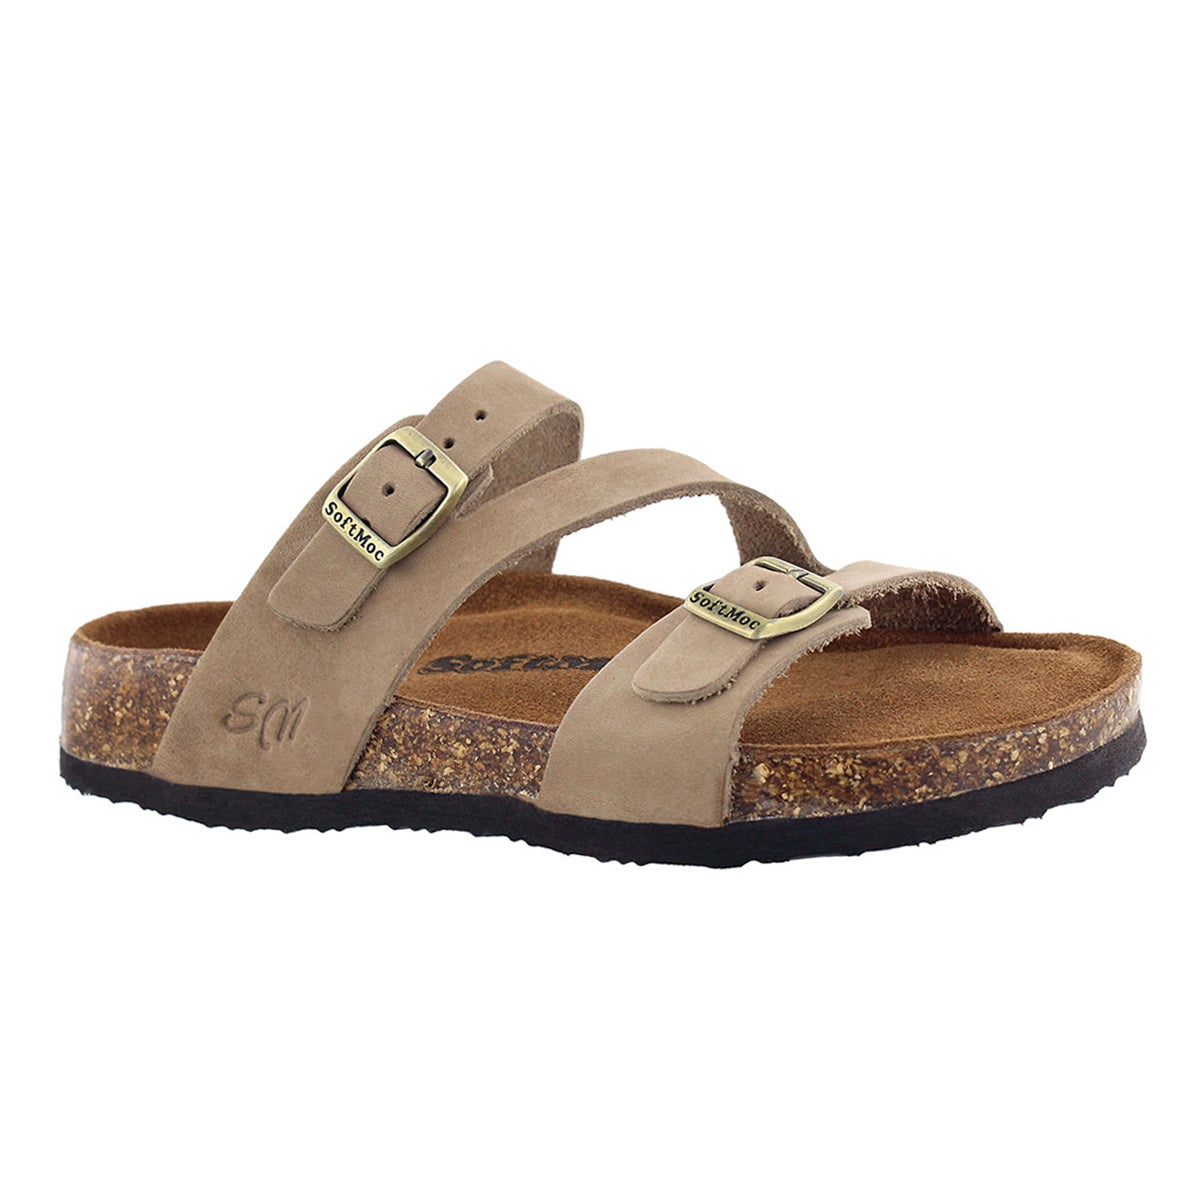 Women's AVALON 5 taupe memory foam sandals